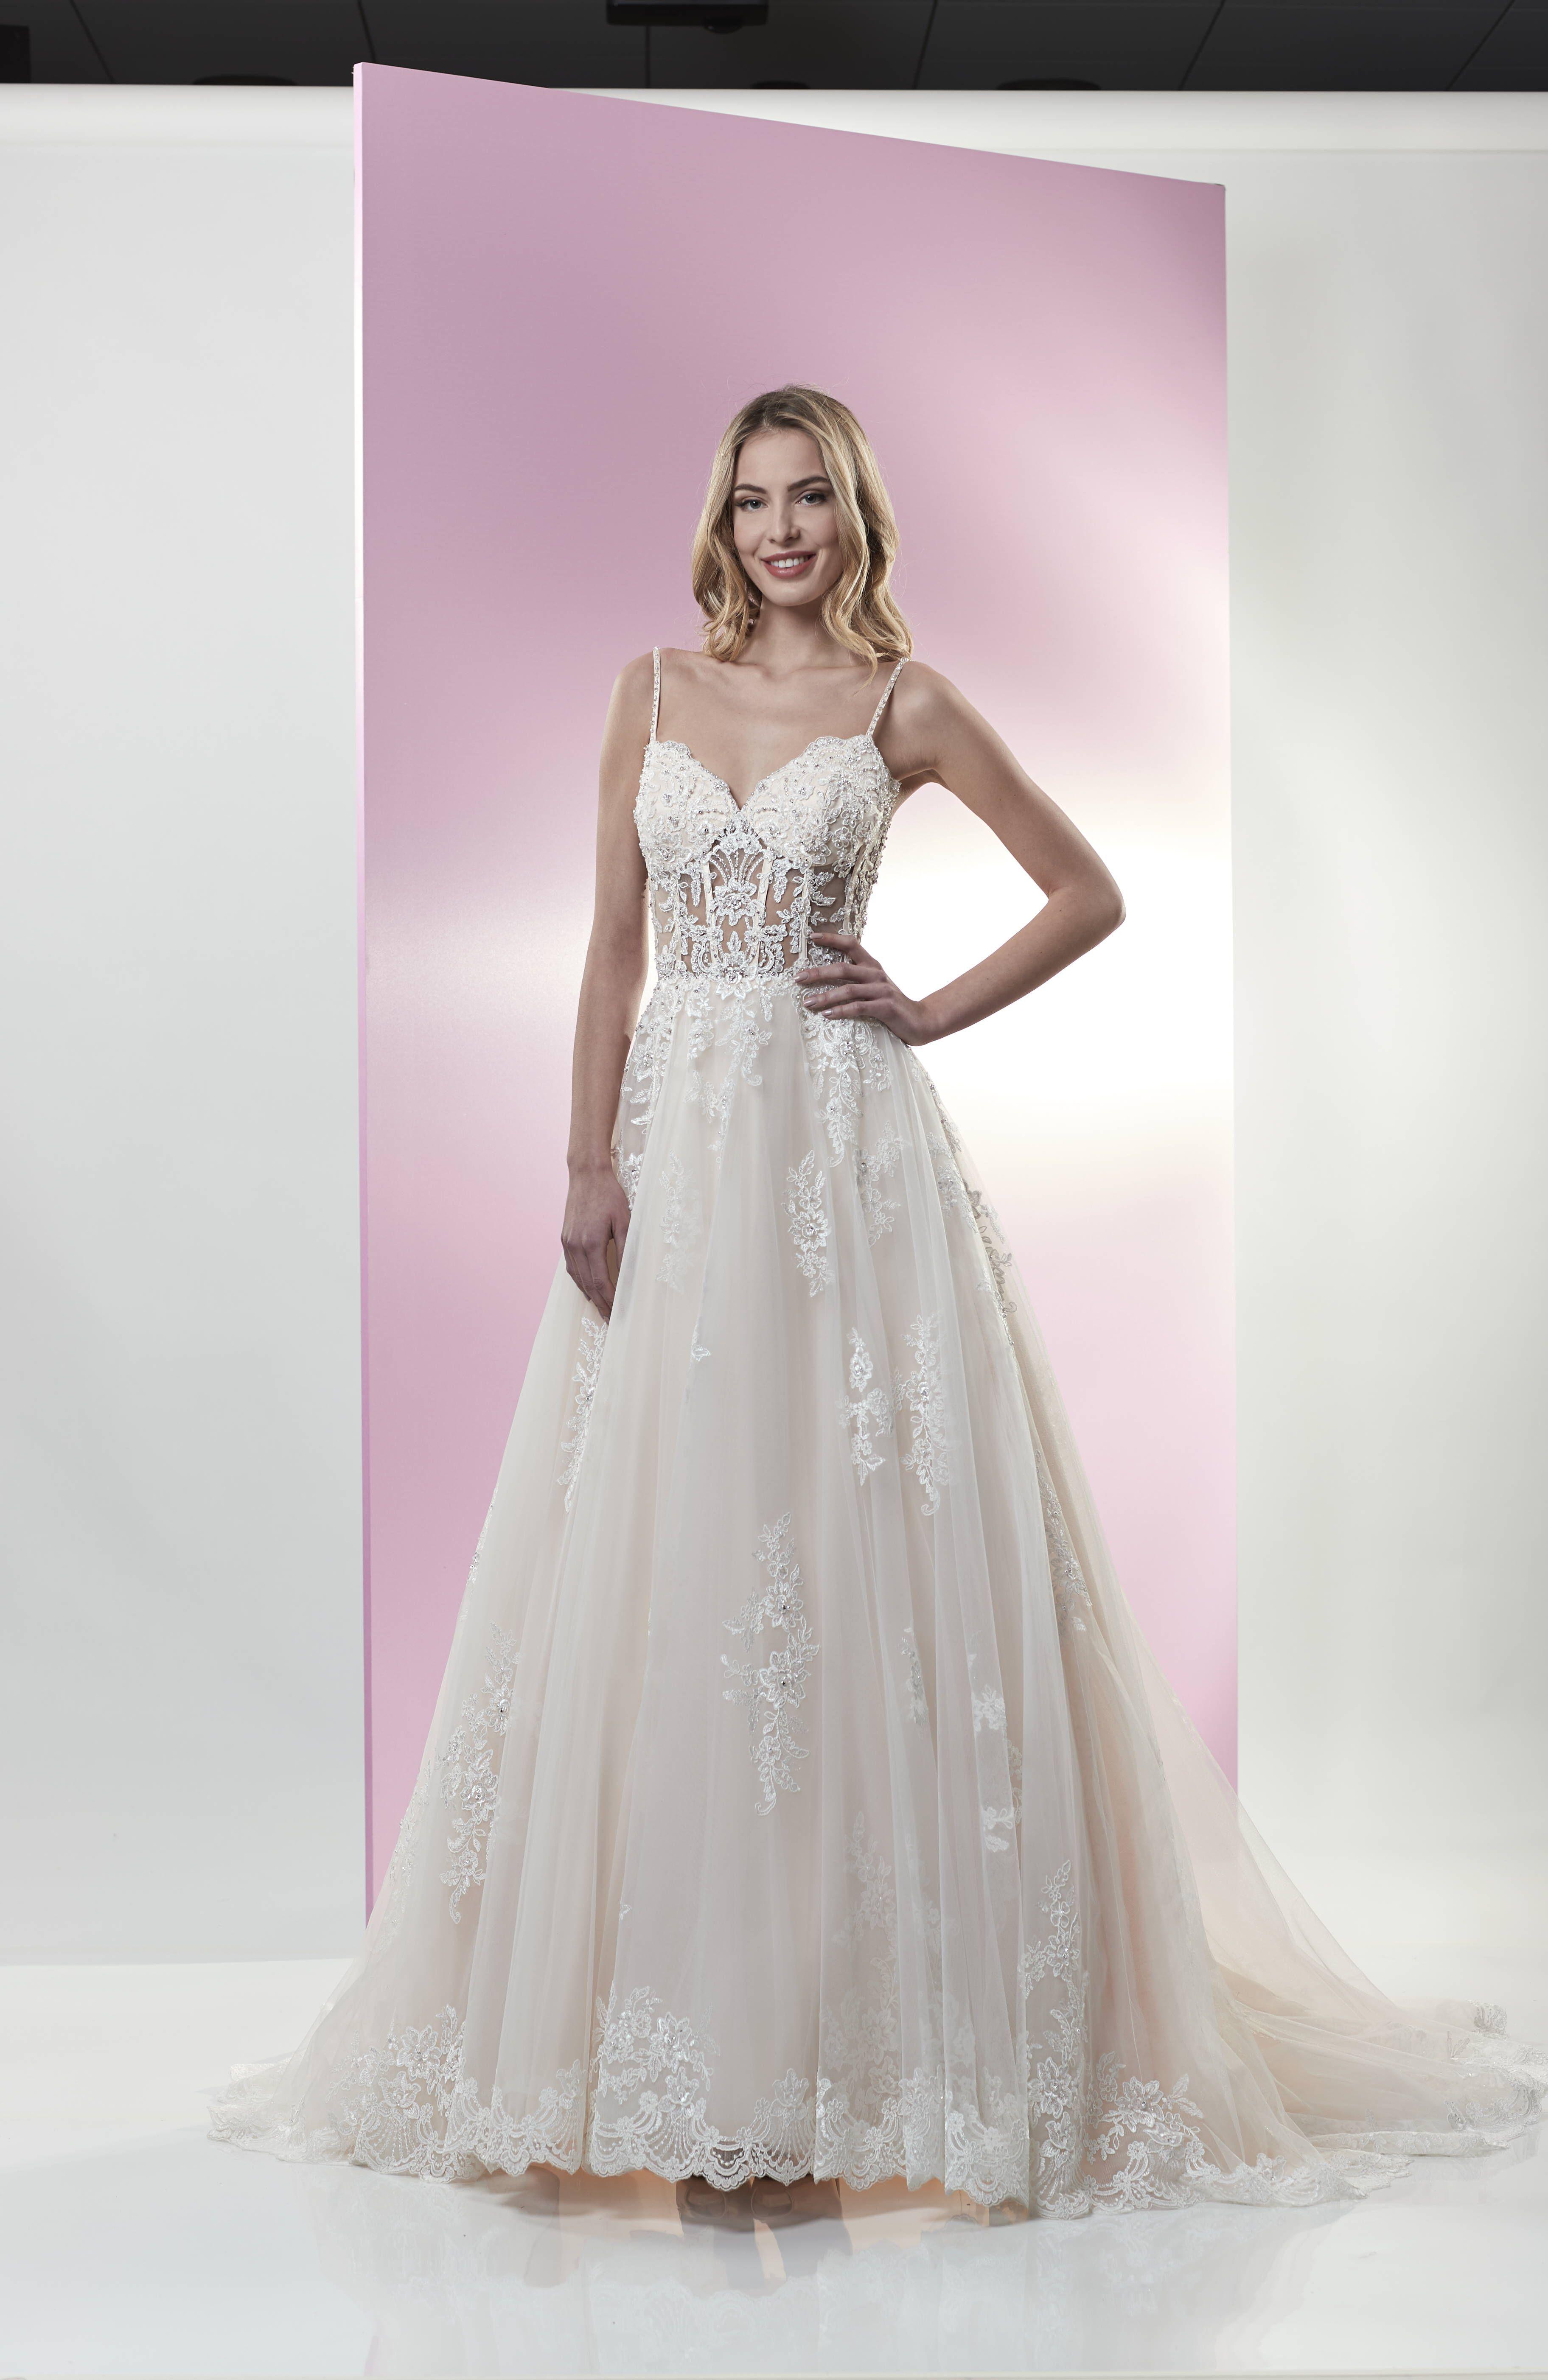 Venus Bridal Collection 17 - Brautkleid VE17  Brautmode